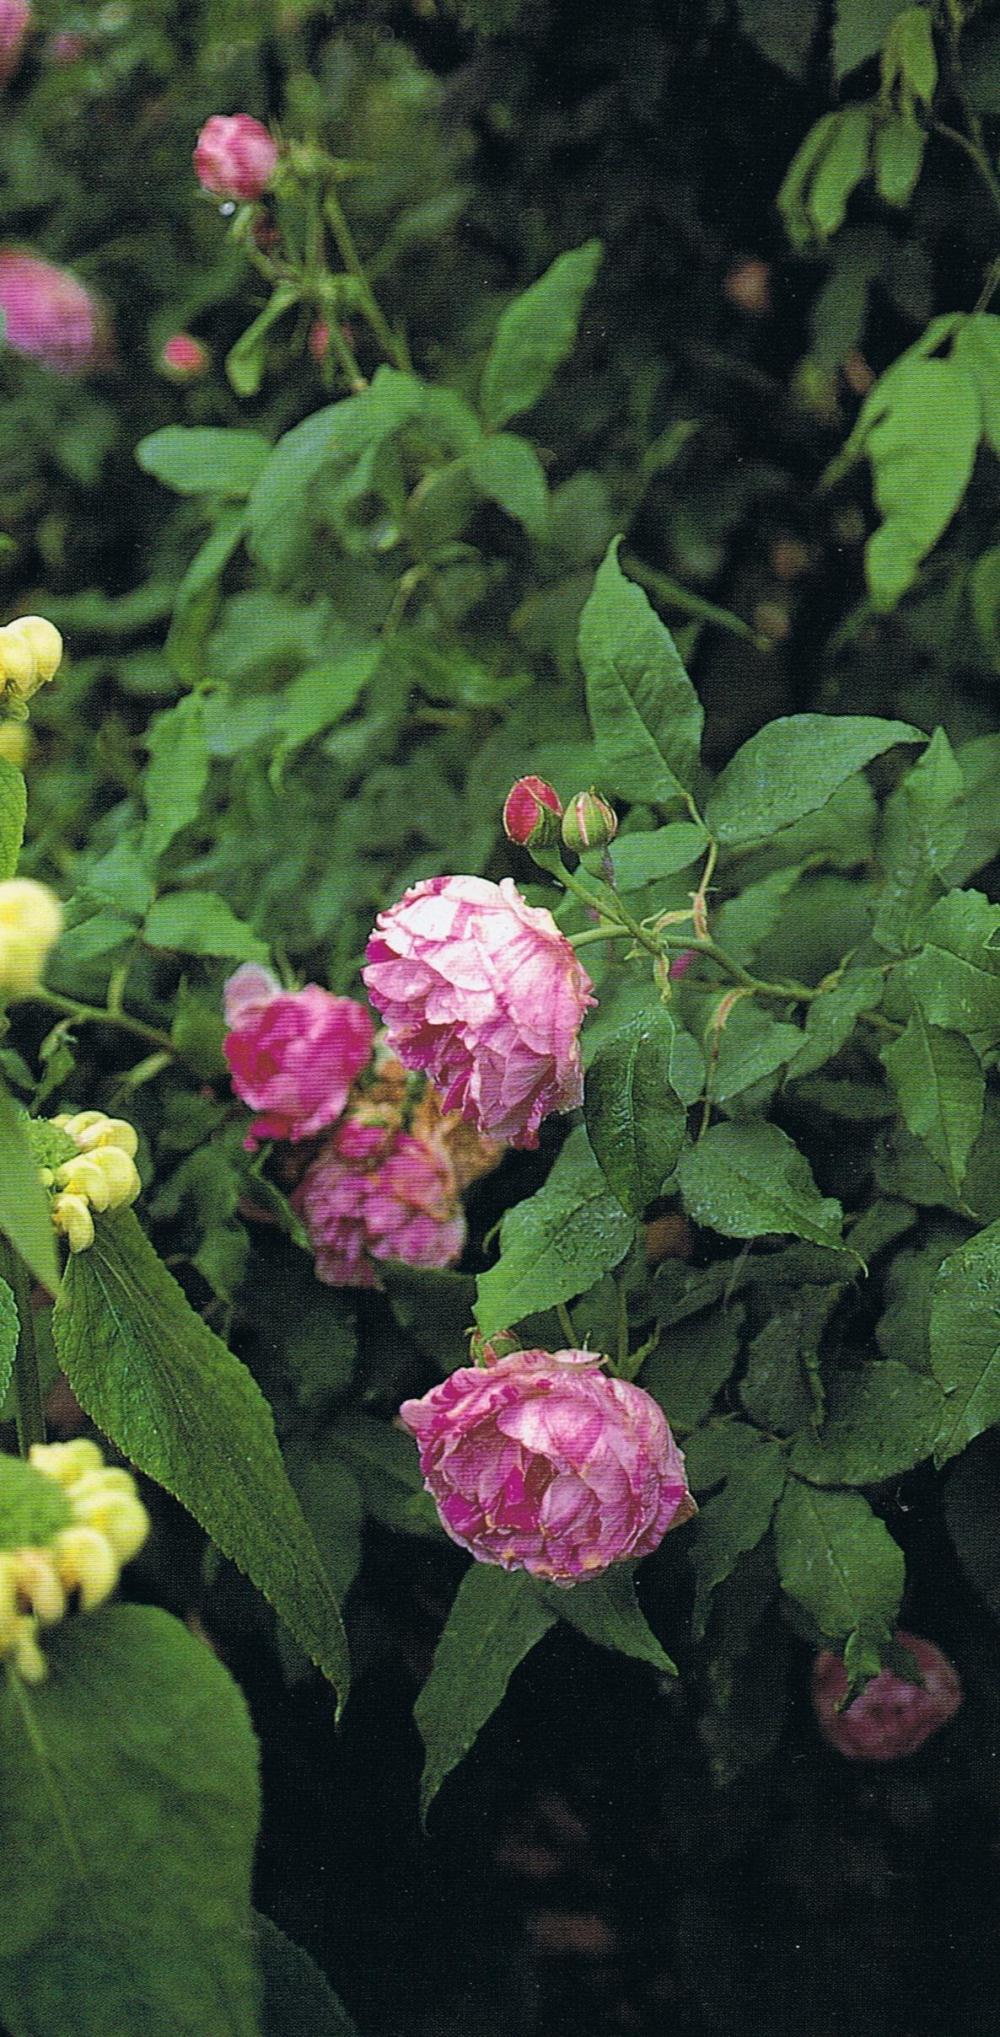 The Glory of Roses Hicote Manor striped rose 2 Phlomis samia